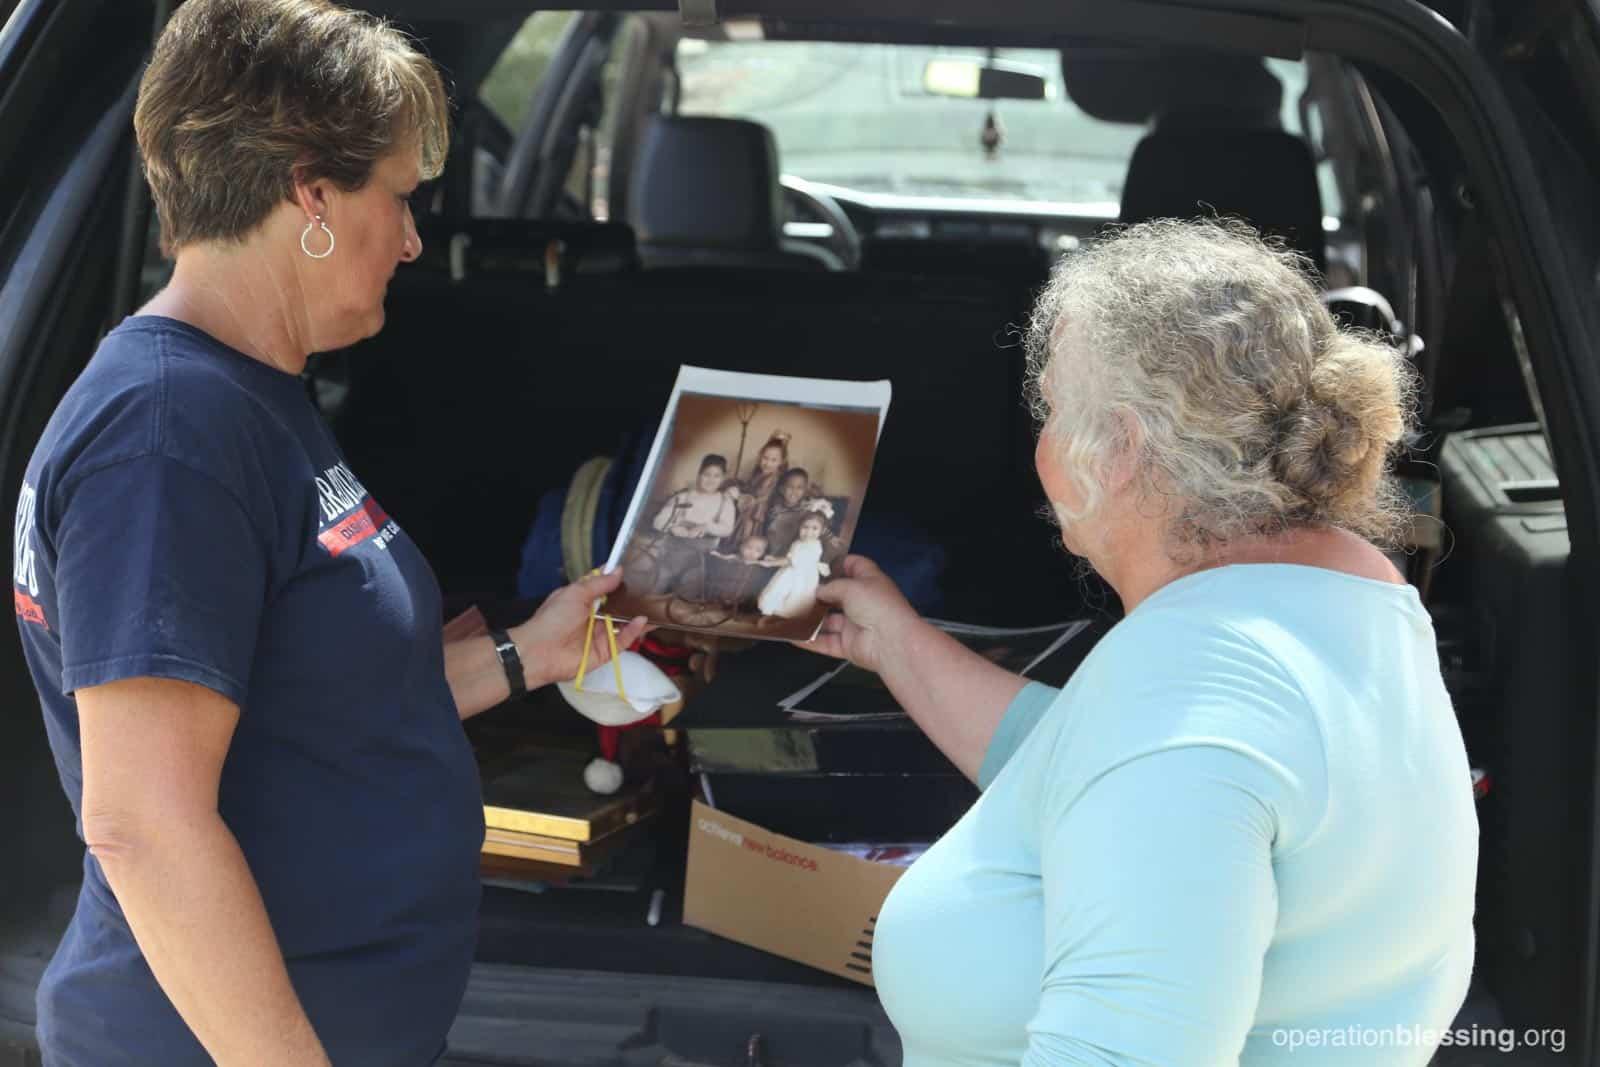 Laura shows Sheila salvaged pictures of her children and grandchildren.